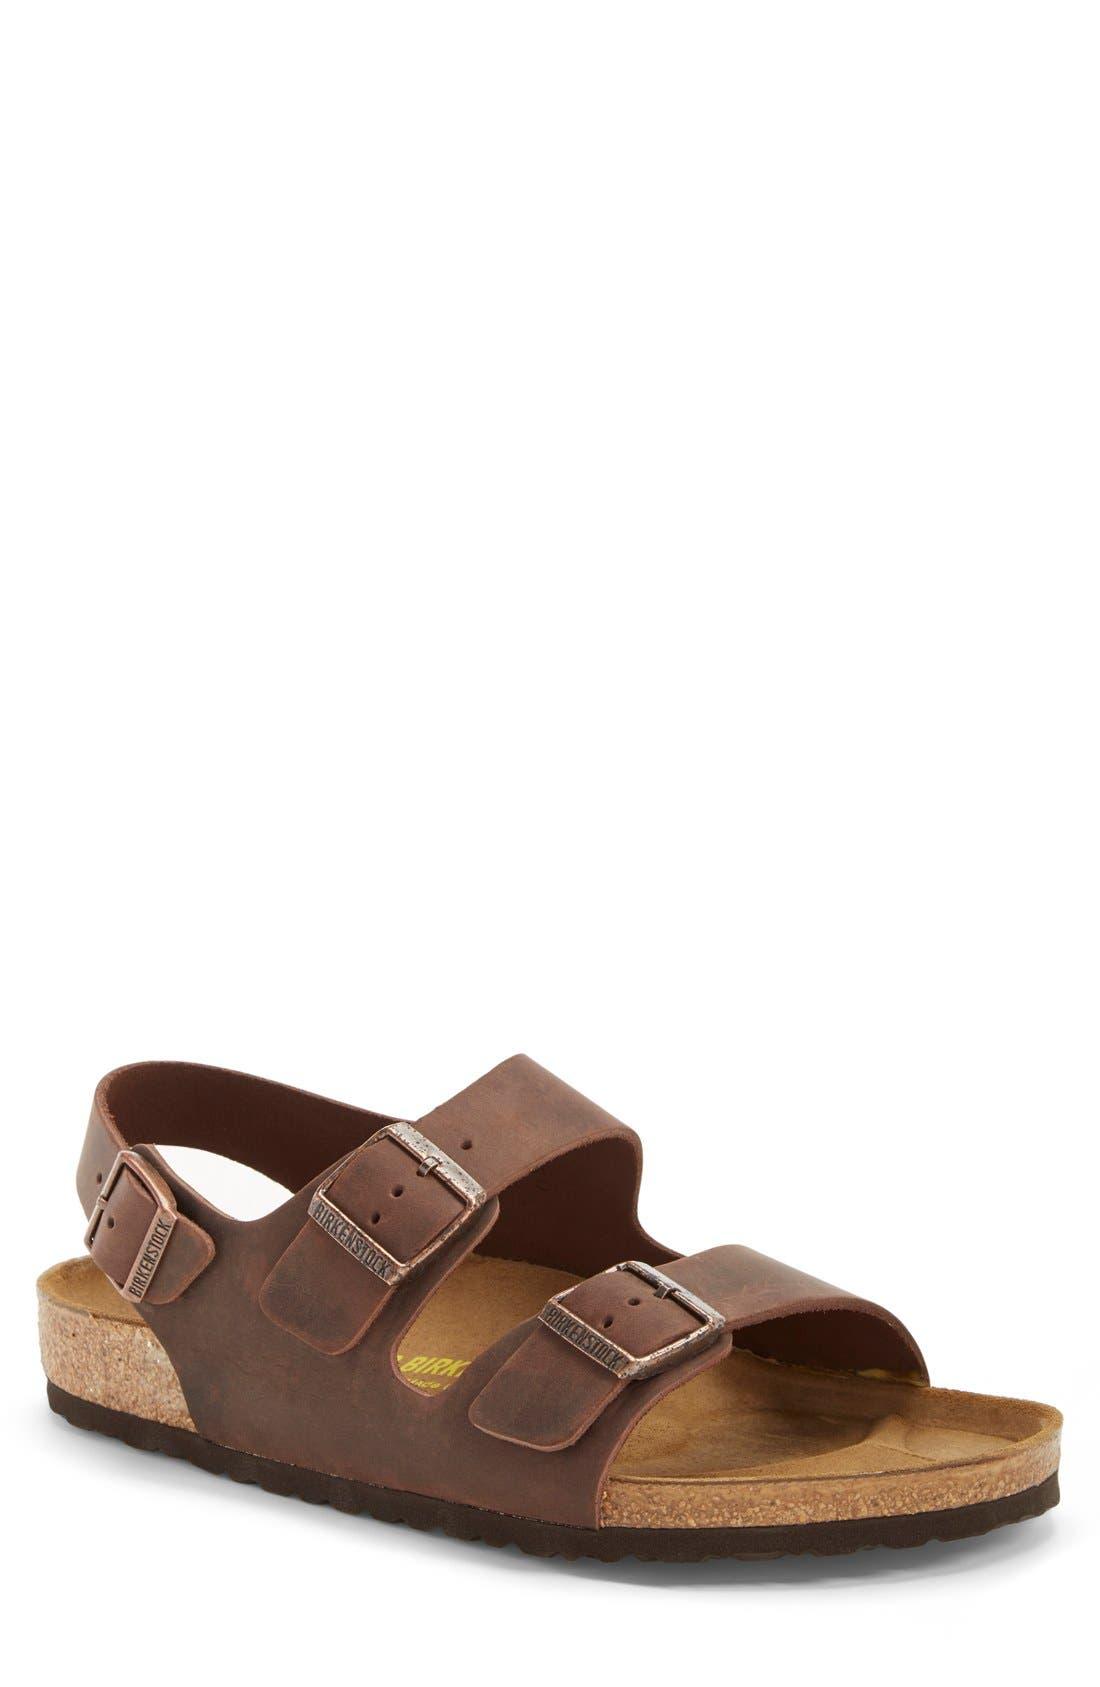 'Milano' Sandal,                         Main,                         color, HABANA OILED